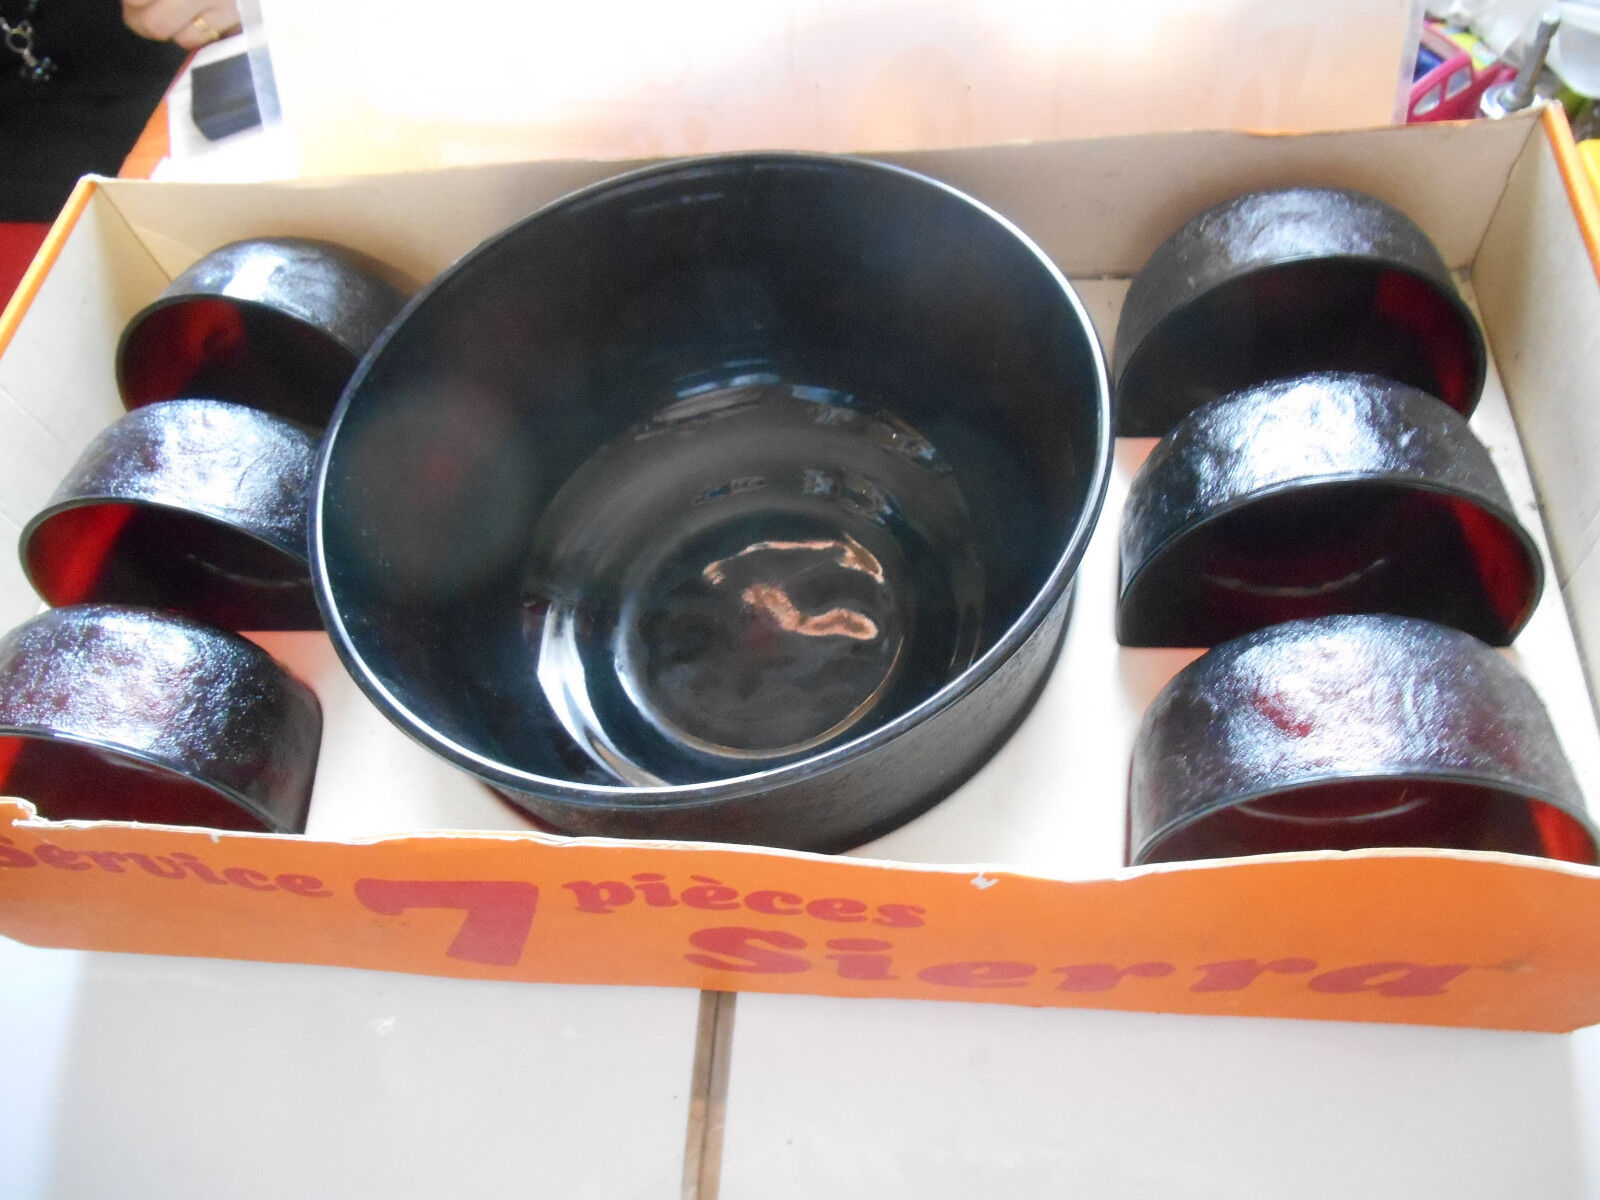 Arcorc sierra saladier coupelle vintage 70's salad bowl  cup old ancien arcopal